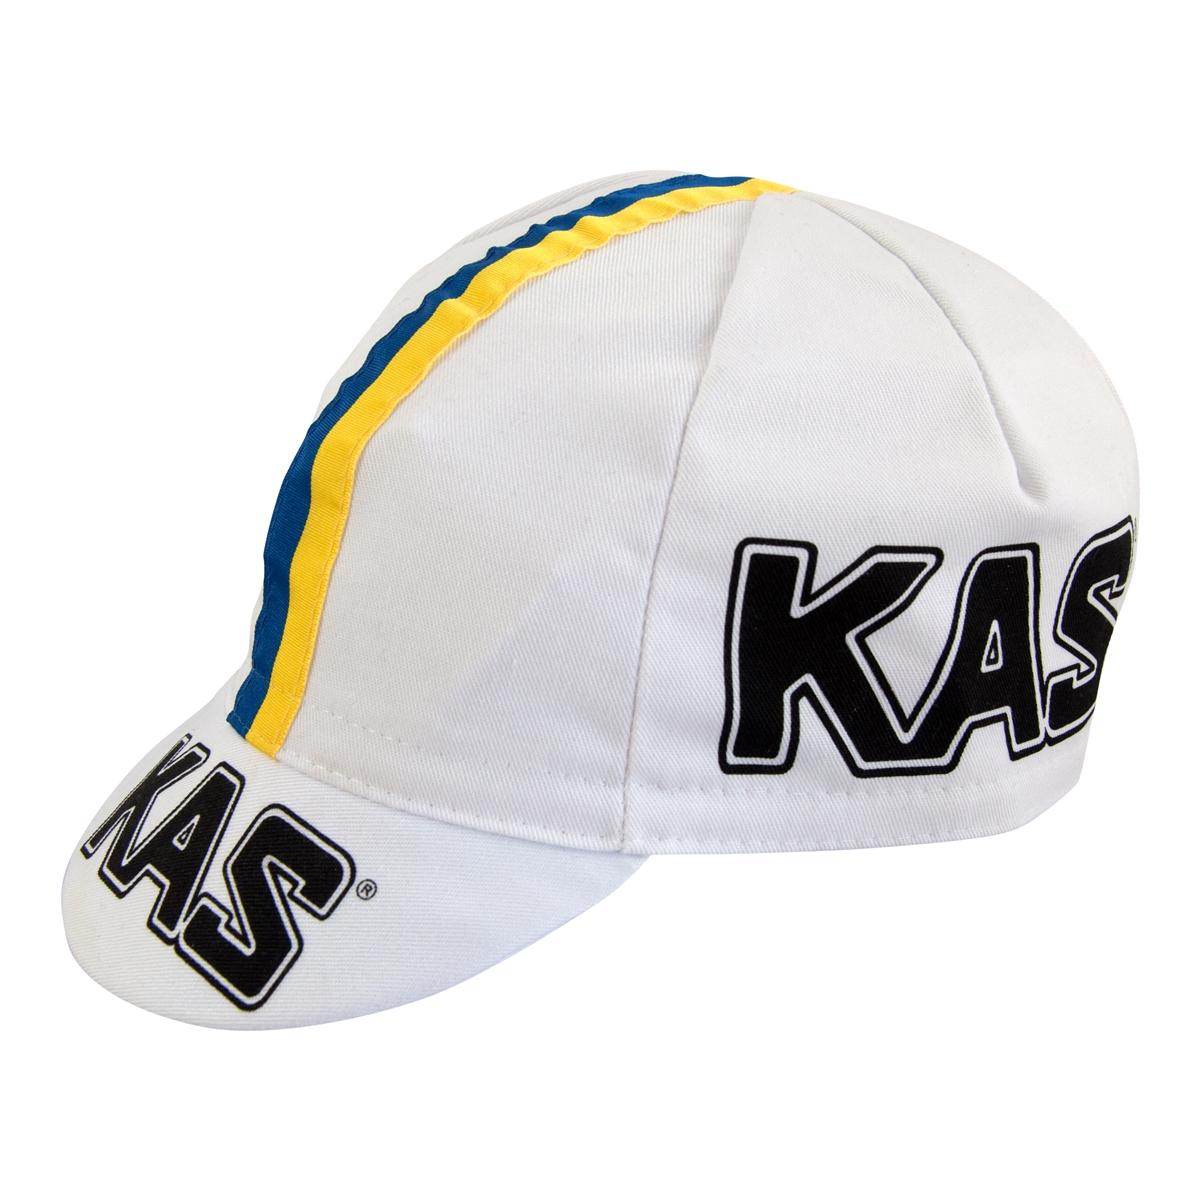 KAS Retro Pro Team Cycling Cap 3580caee3